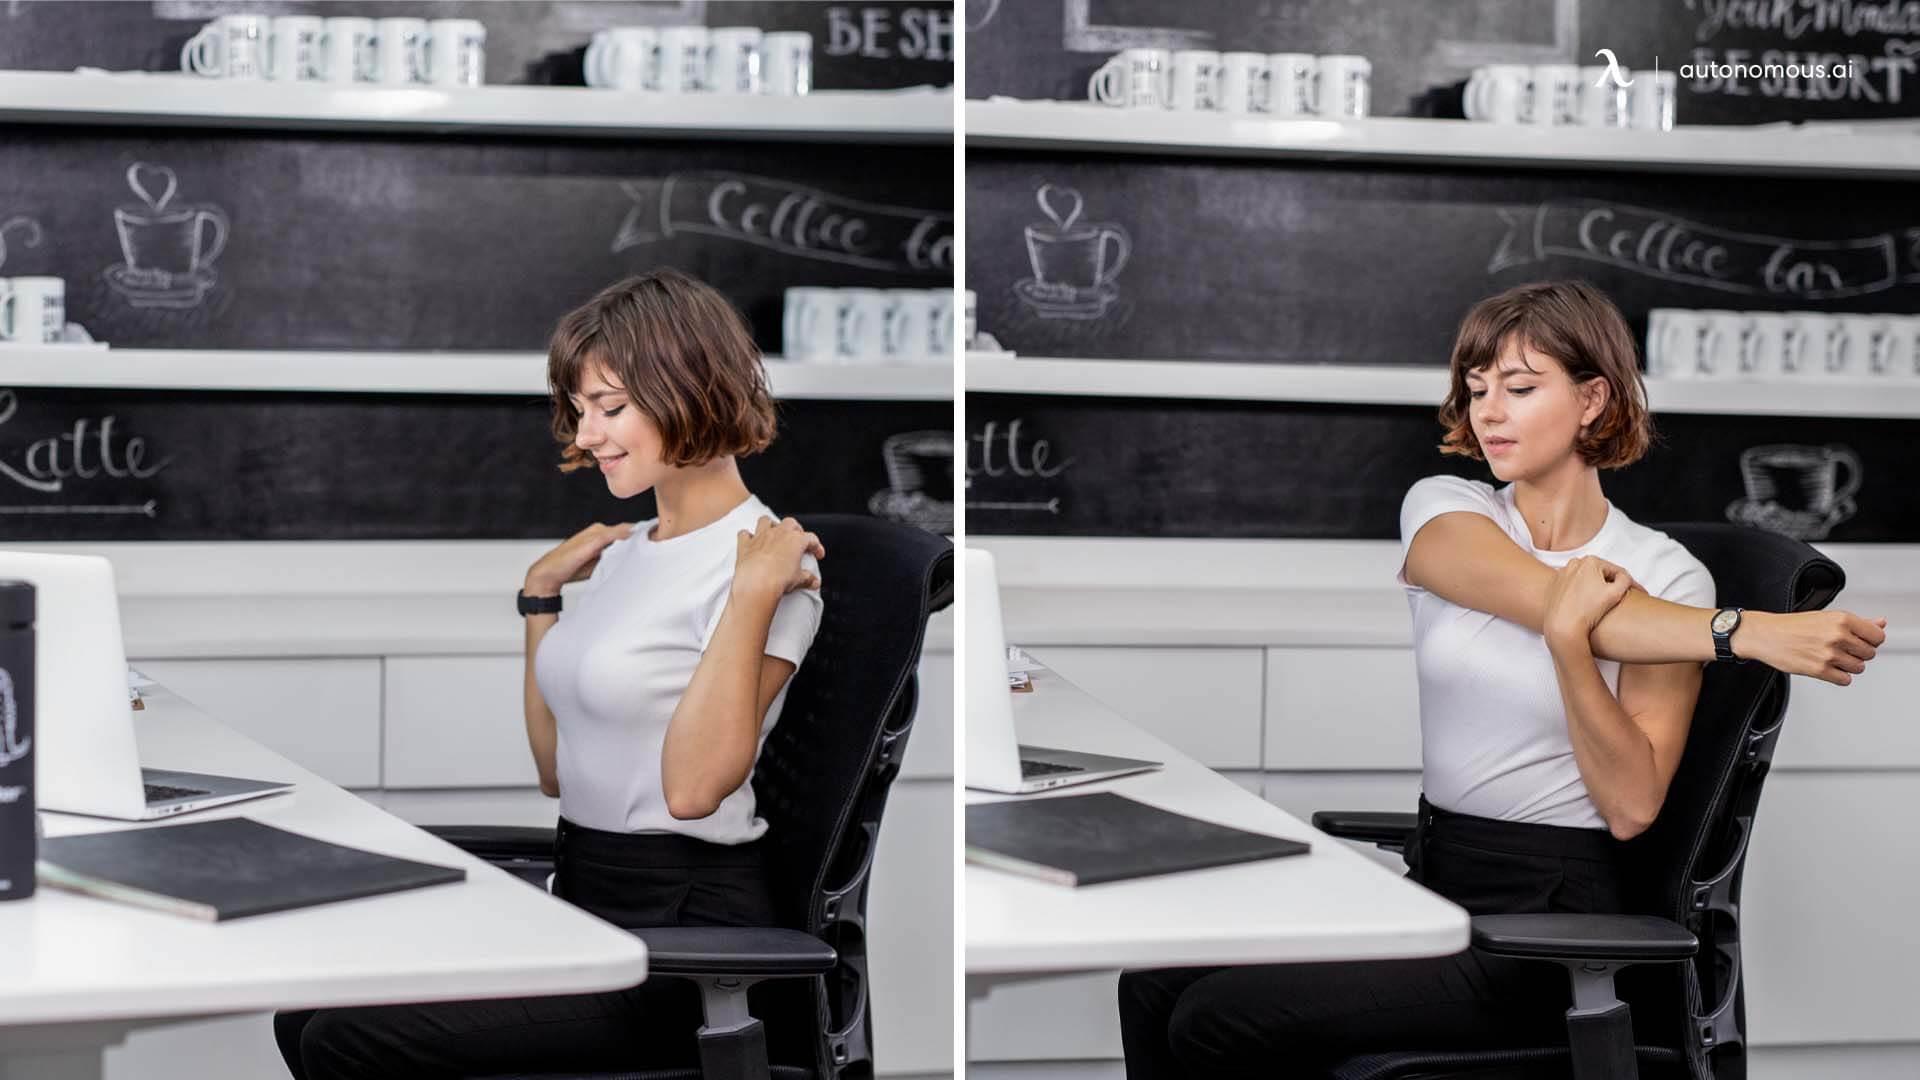 Do shoulder rolls while using standing desk